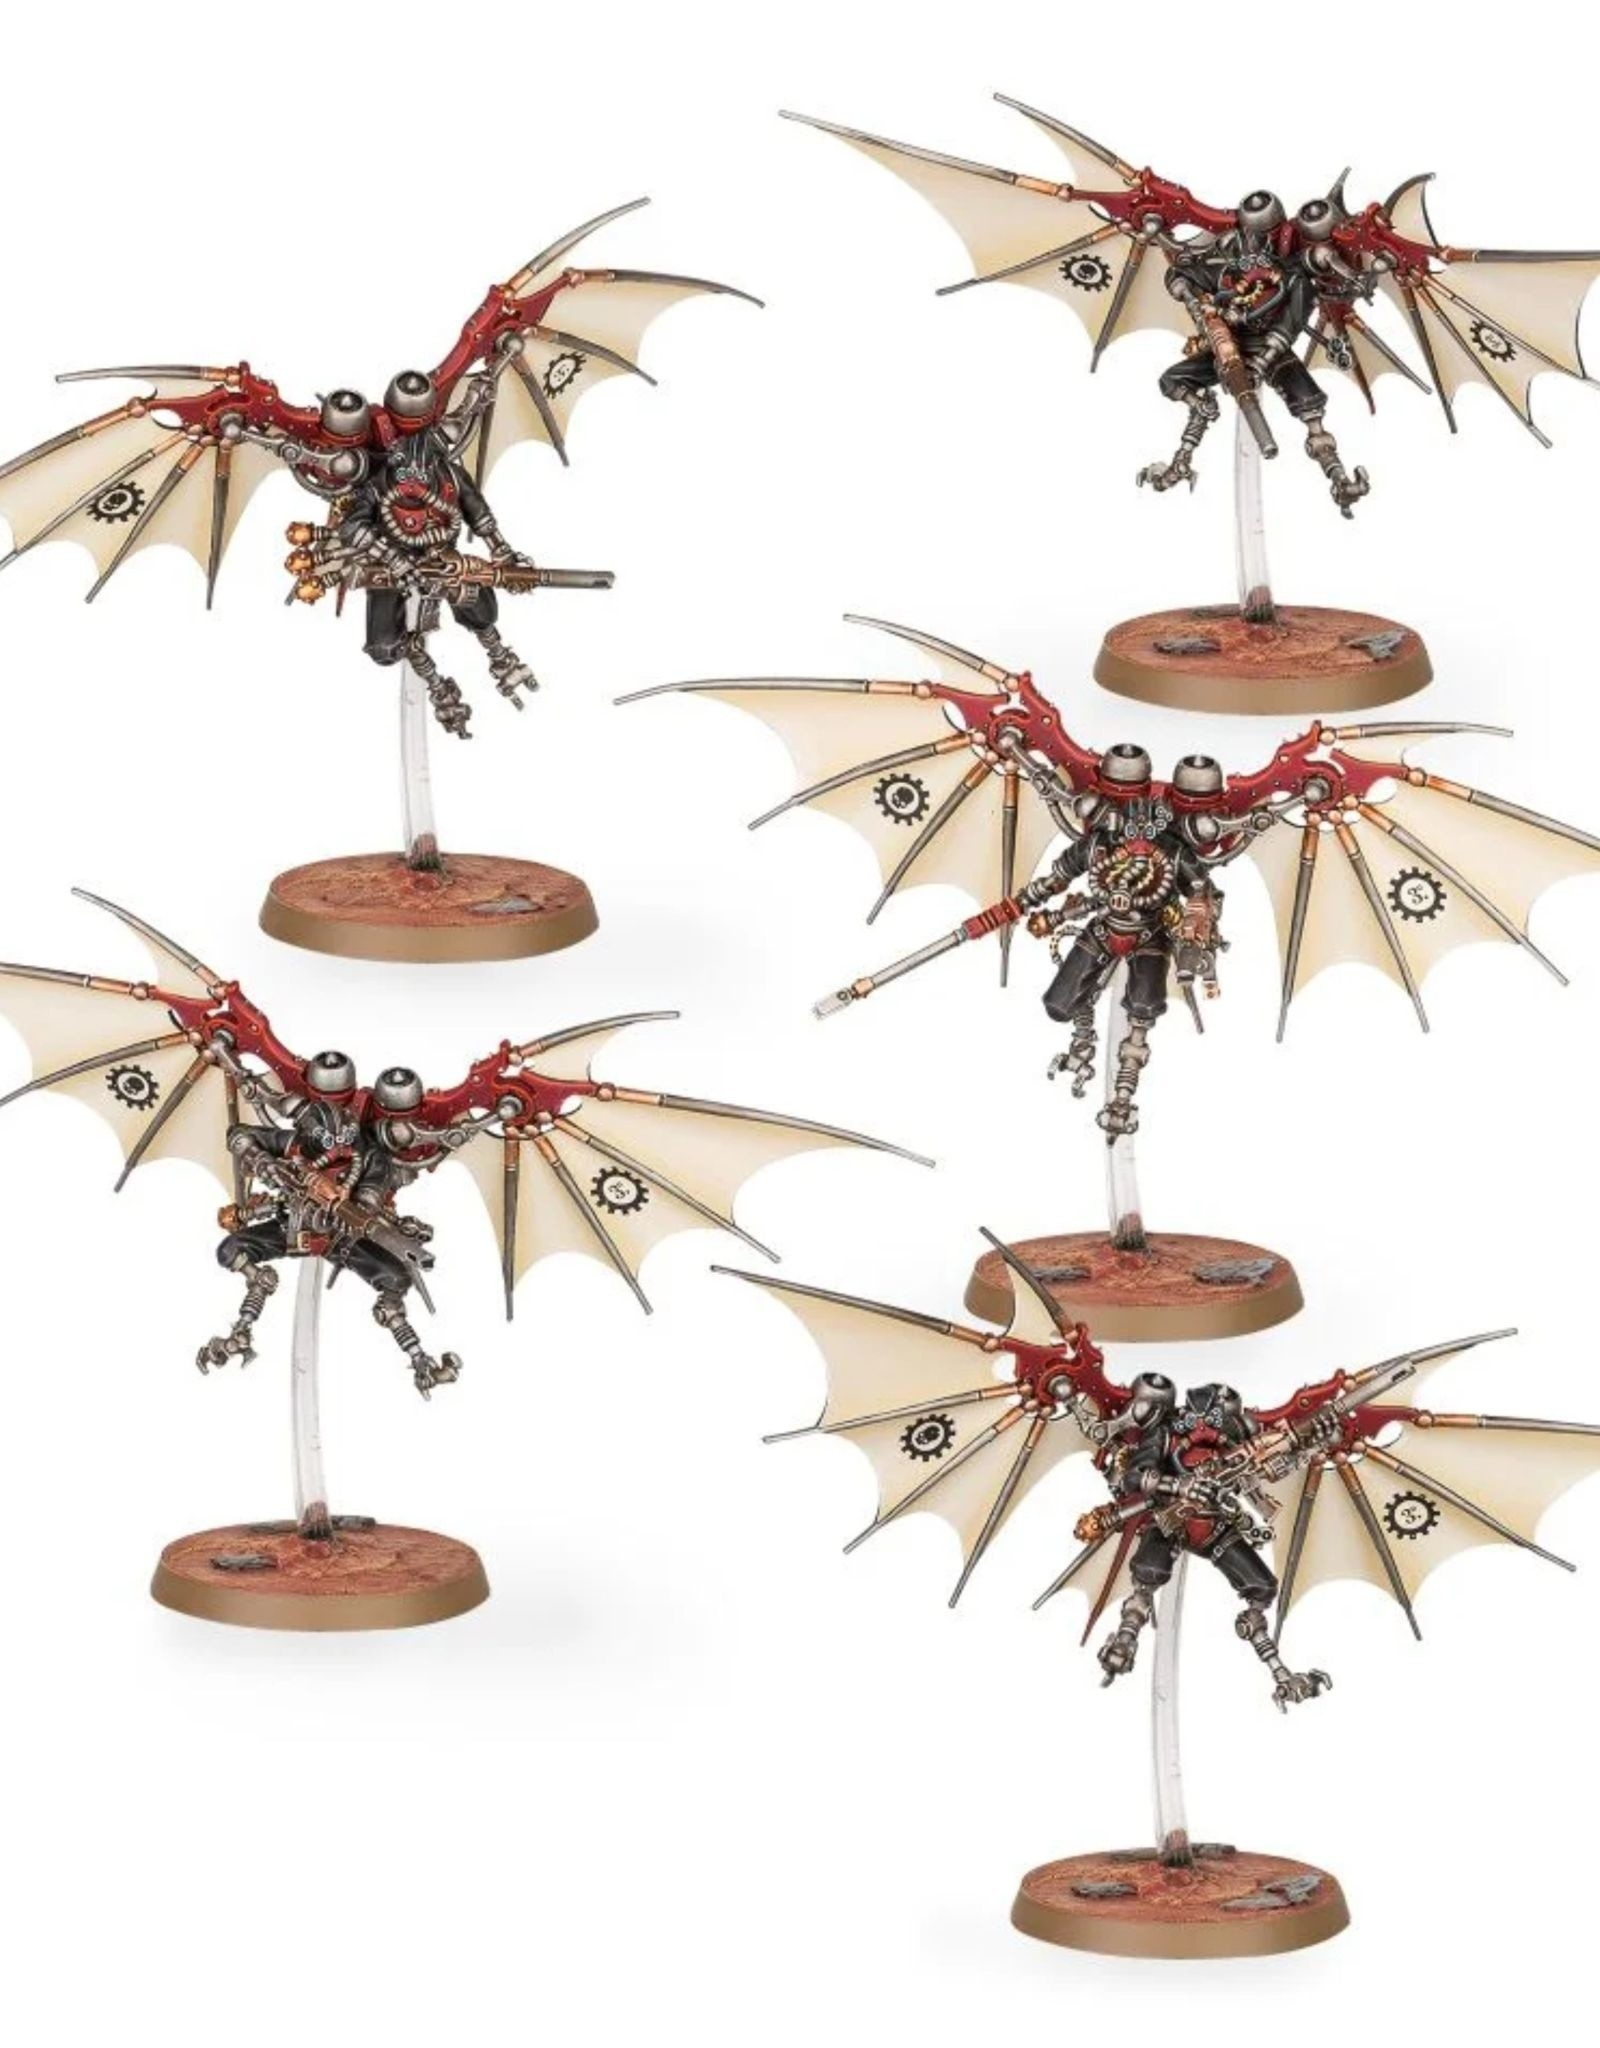 Warhammer 40k Adeptus Mechanicus - Pteraxii